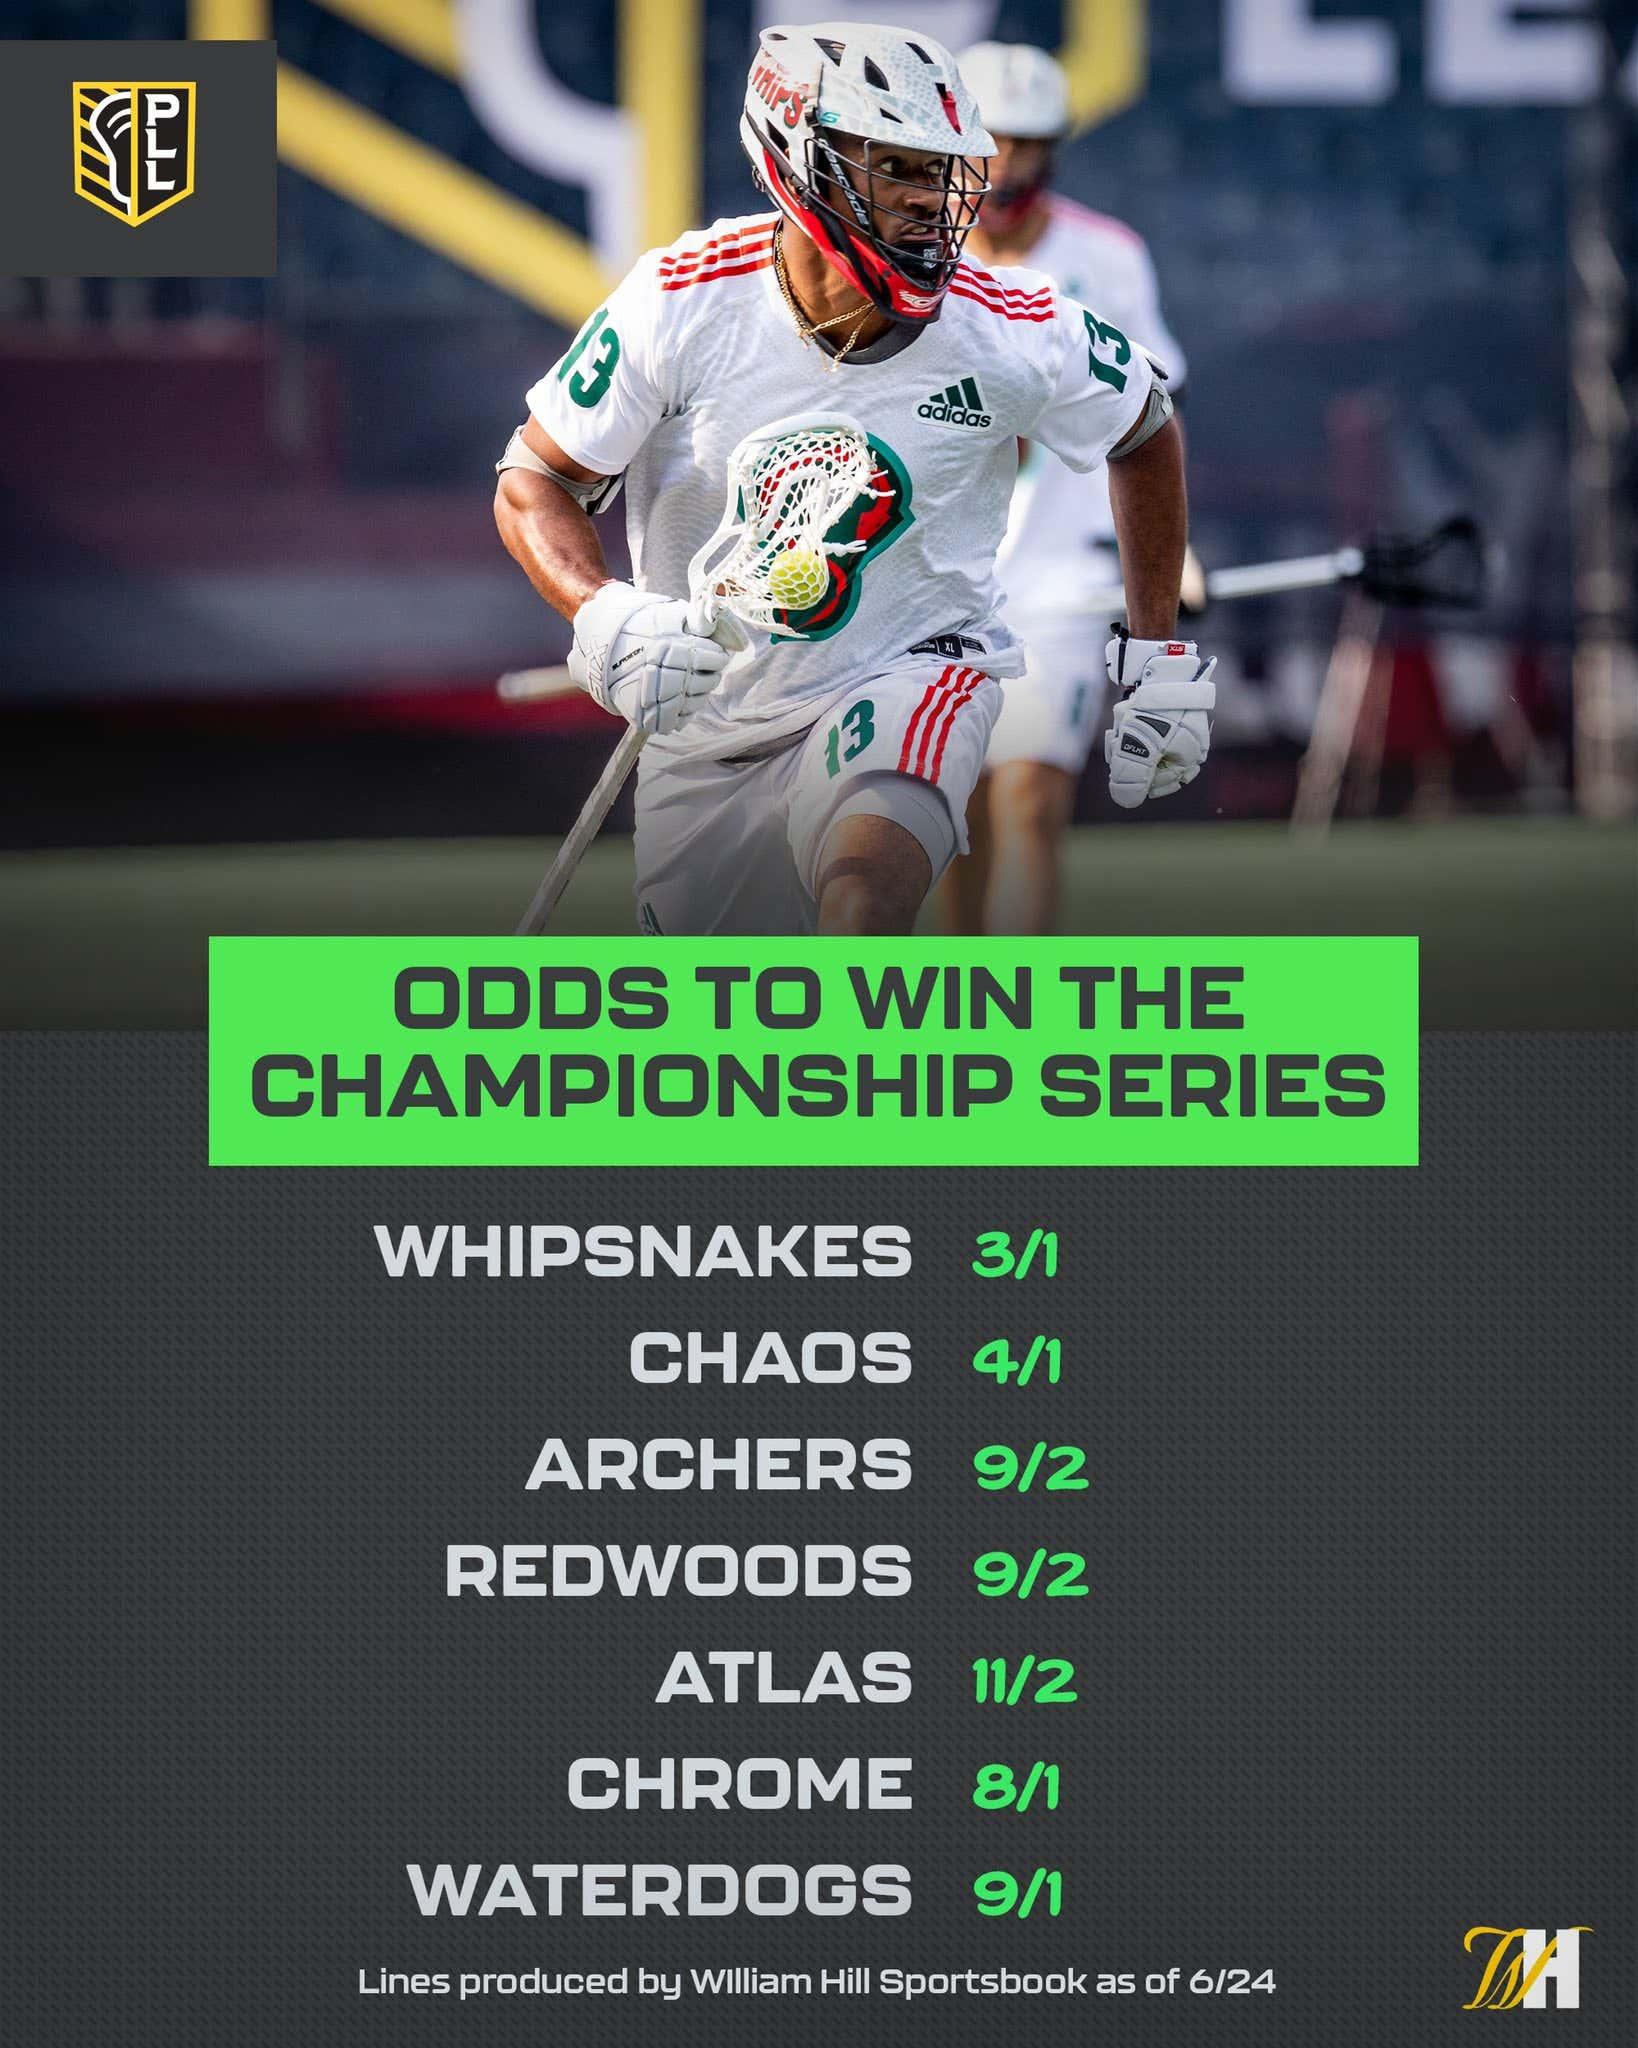 pll-championshipseries-odds.jpeg